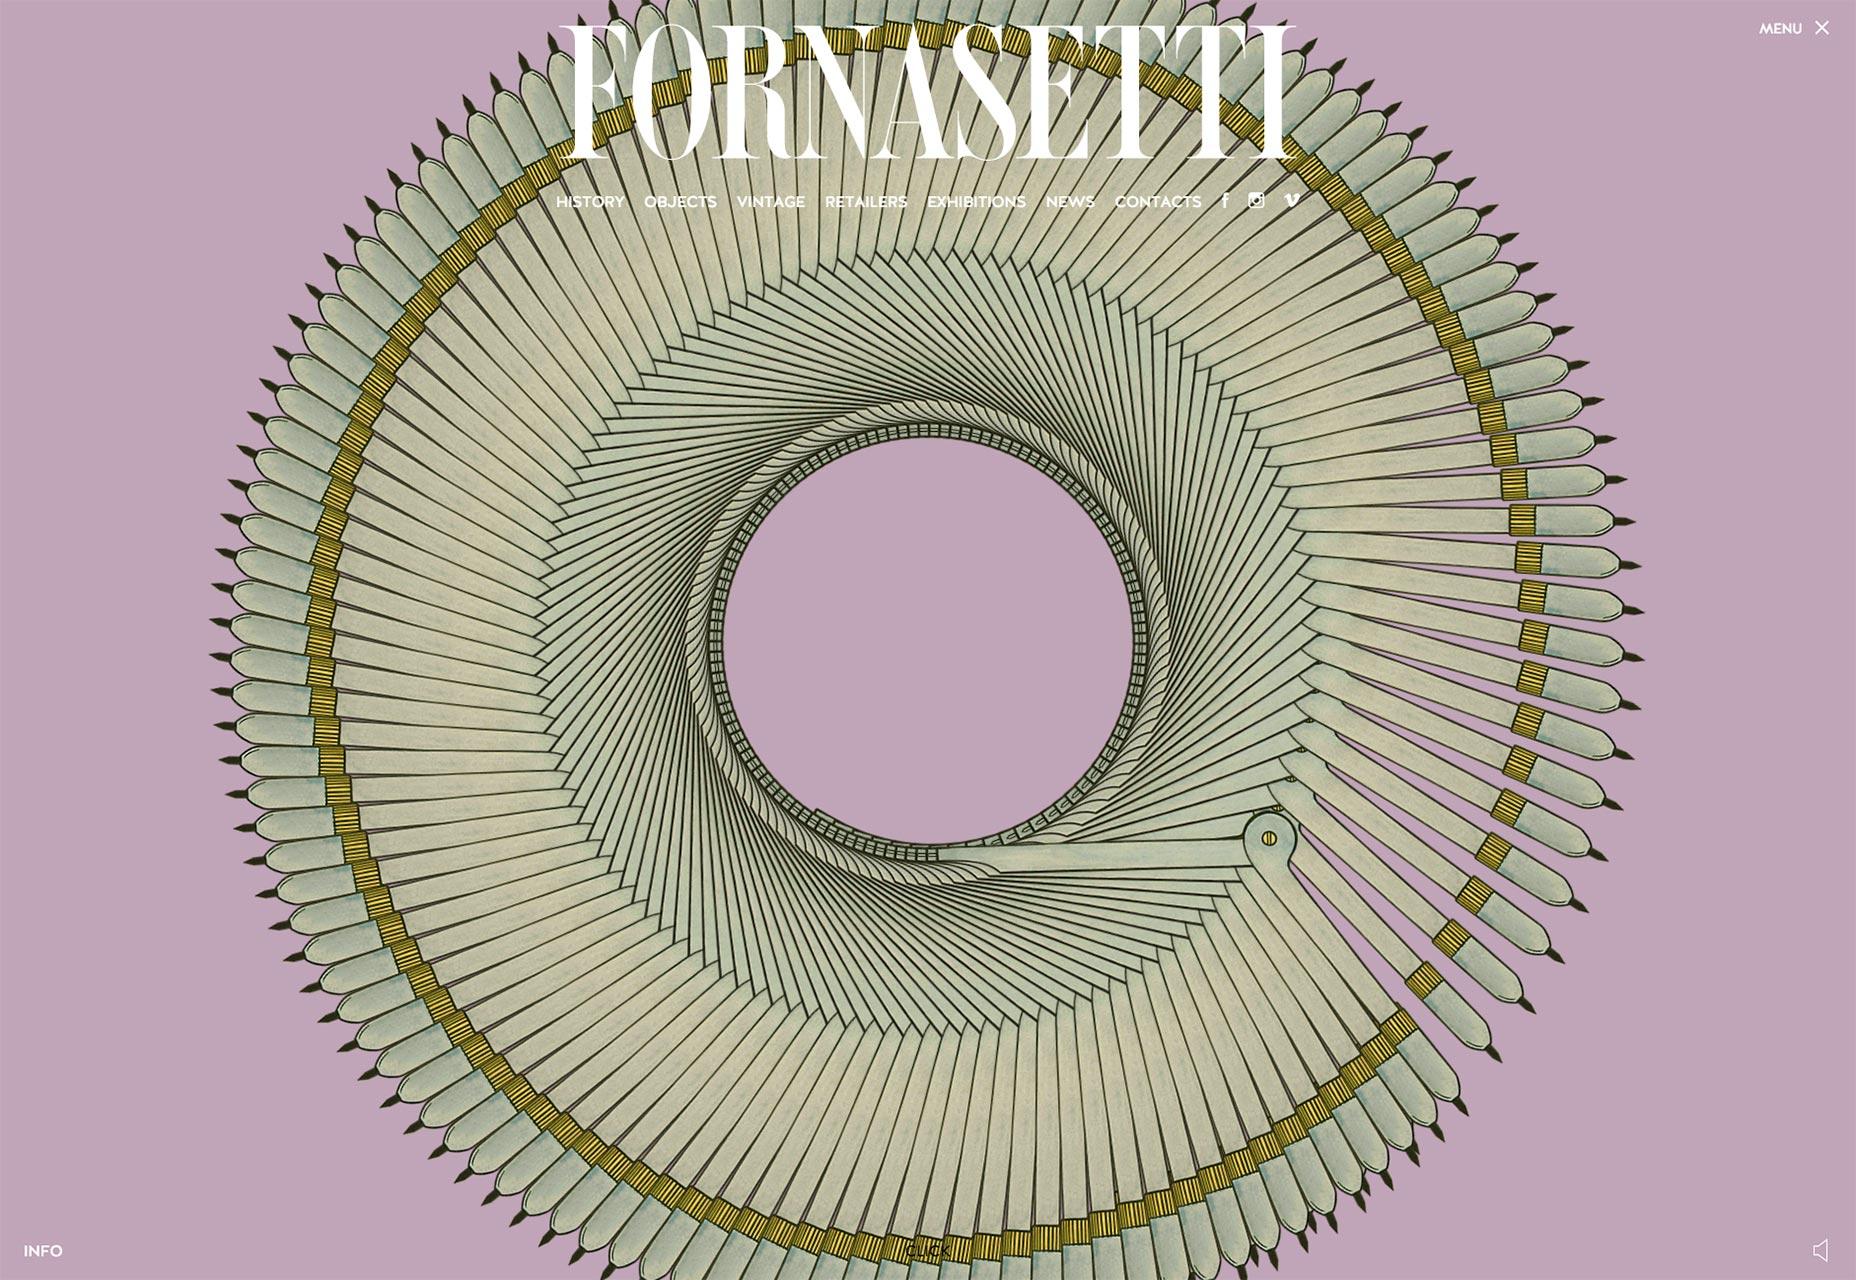 004_fornasetti